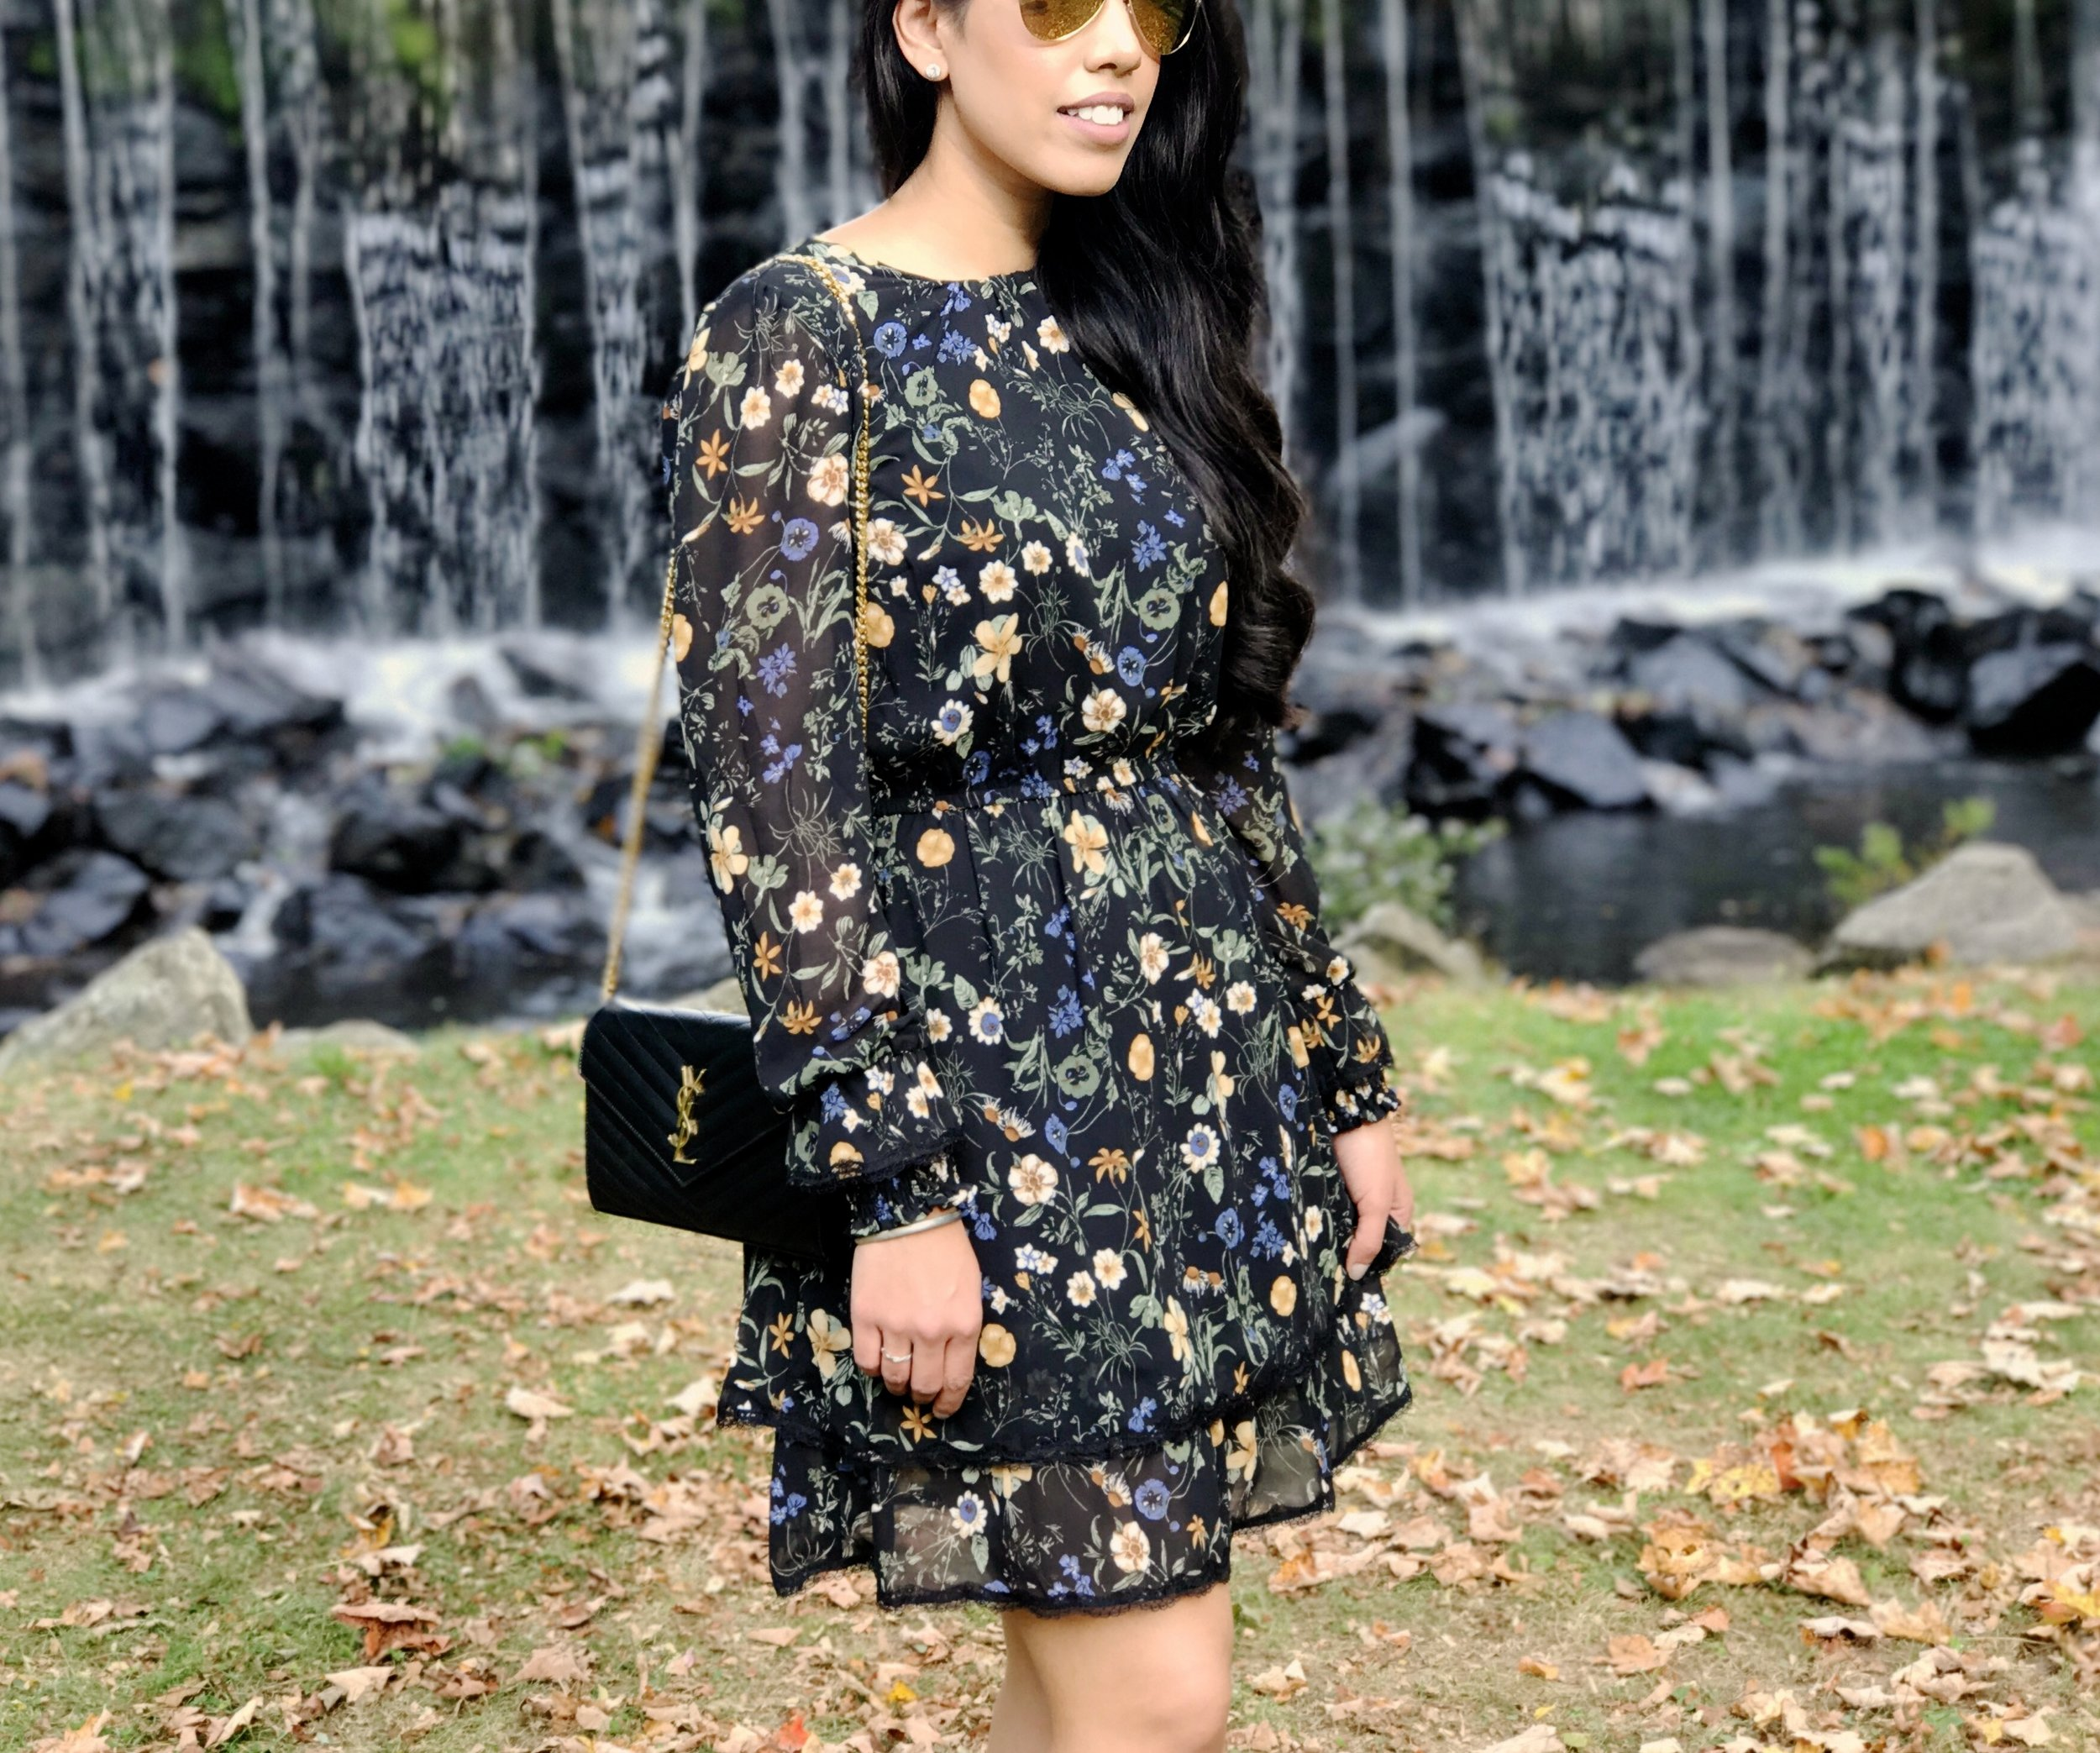 floral-midi-dress-fall-fashion-trend-connecticut